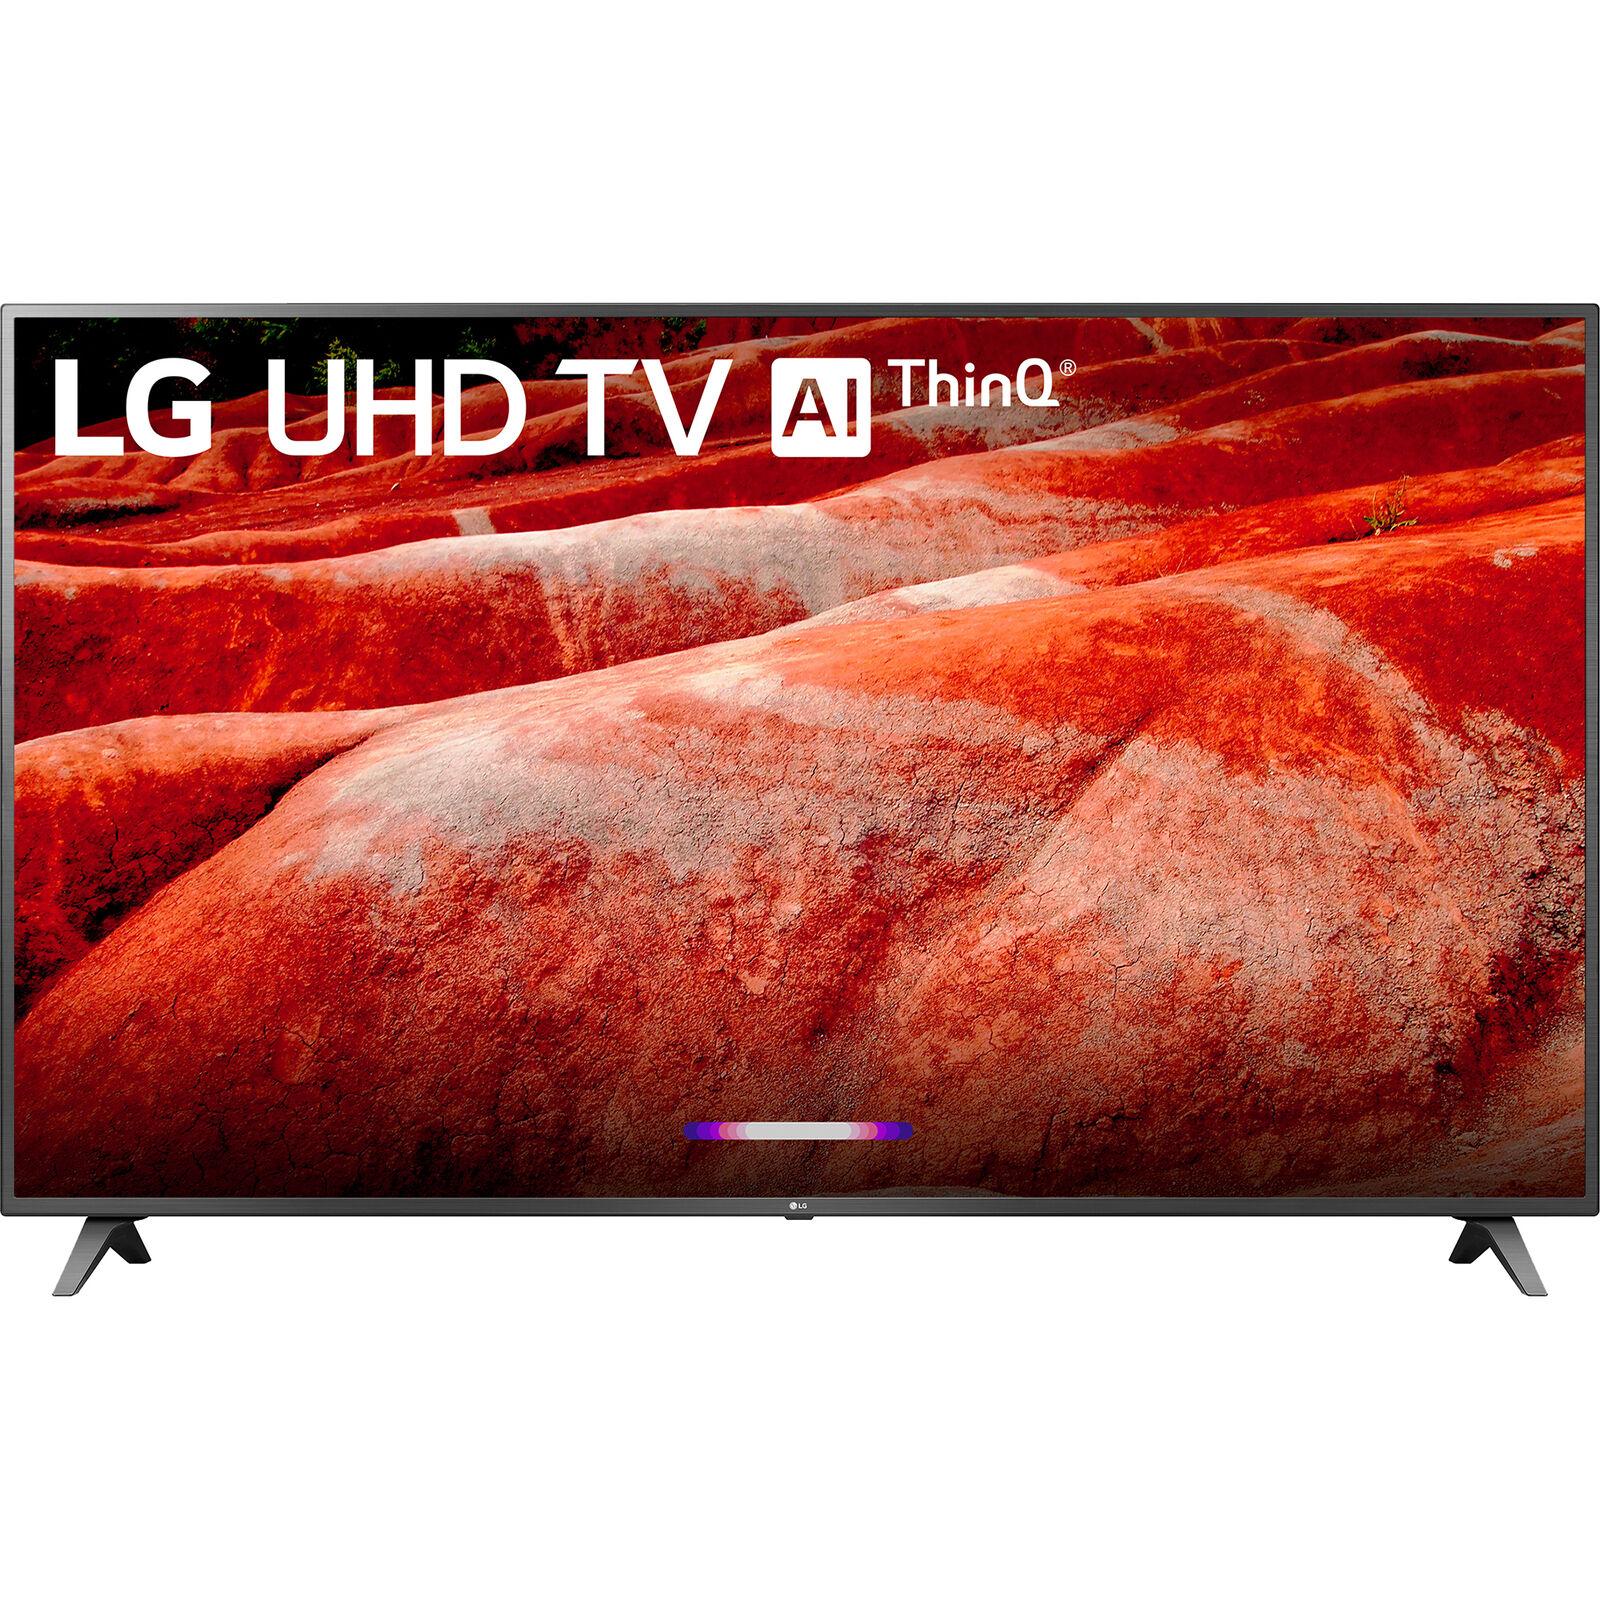 "82"" LG 82UM8070PUA 4K HDR TV $1,699 or 75"" LG 75SM8670PUA 4K HDR TV $1,369 + free s/h $1699"